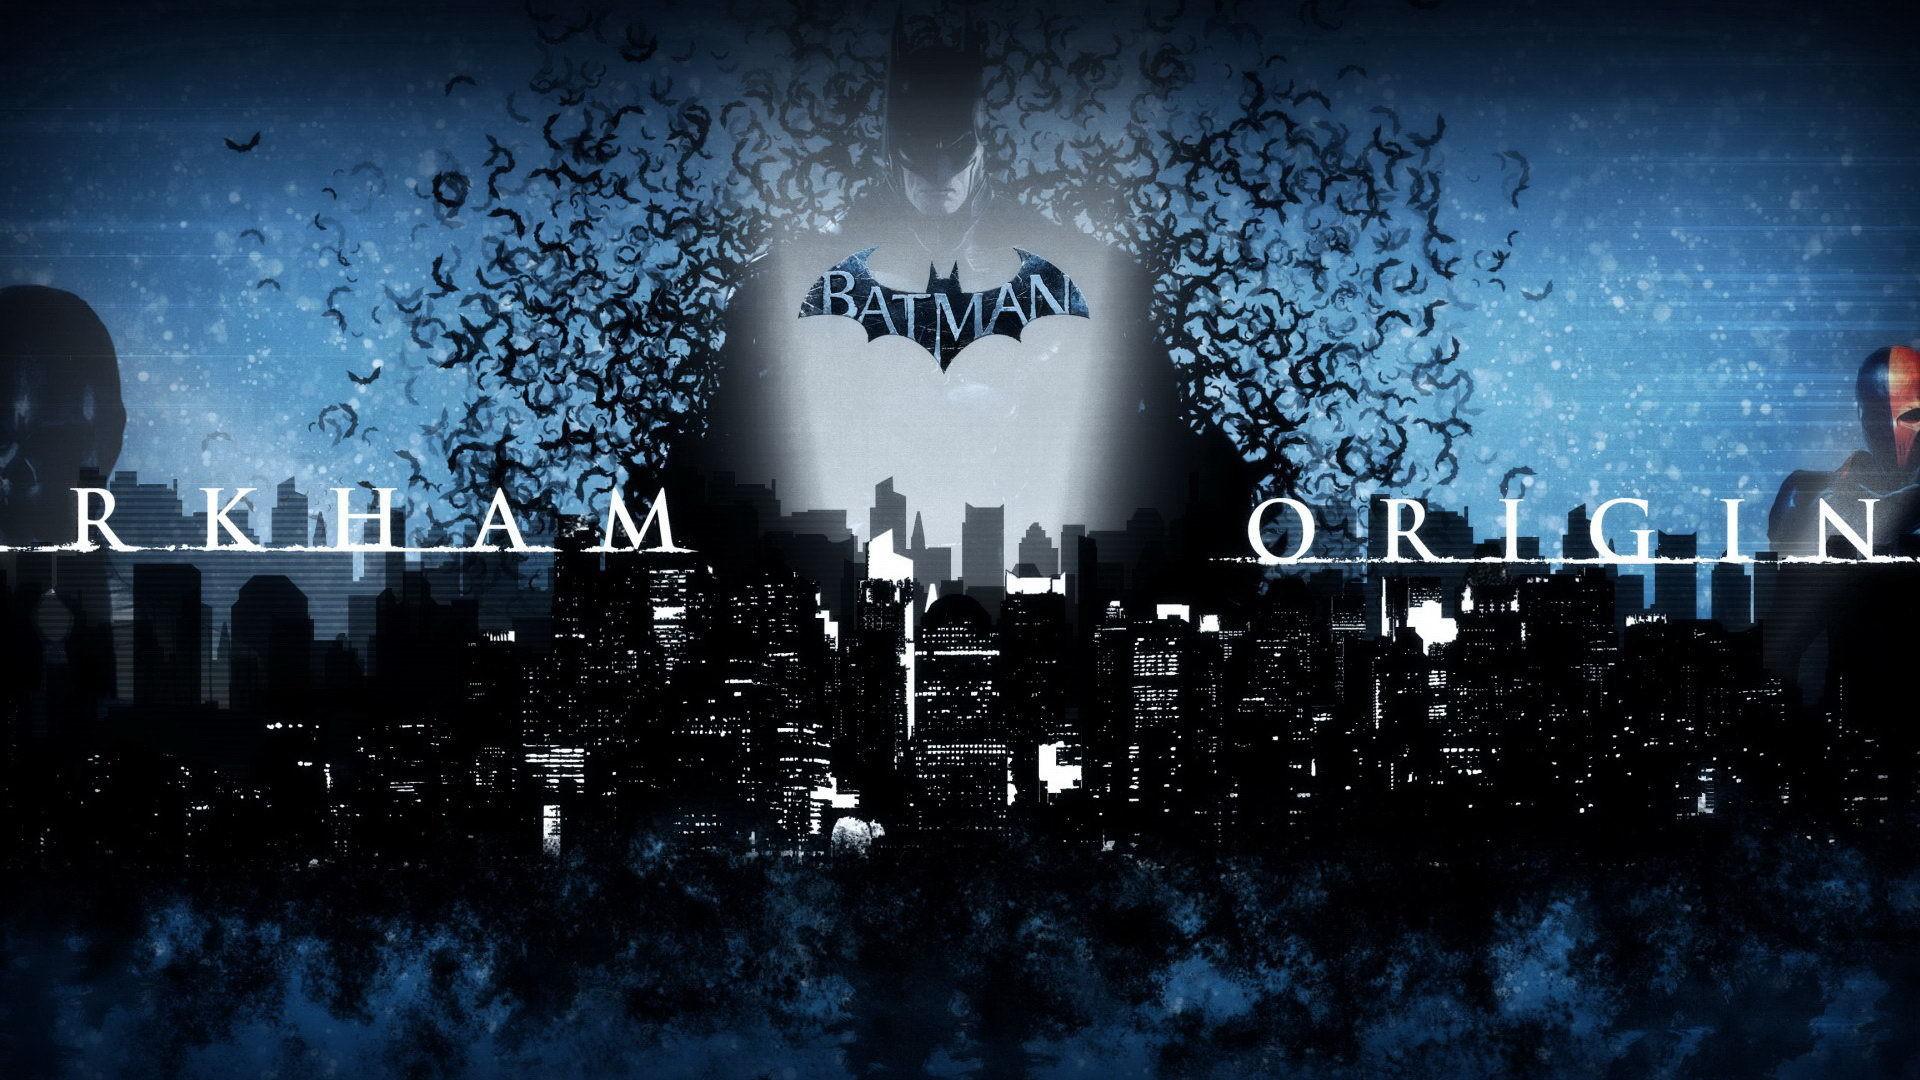 Batman: Arkham Origins screensaver hd wallpapers and images .